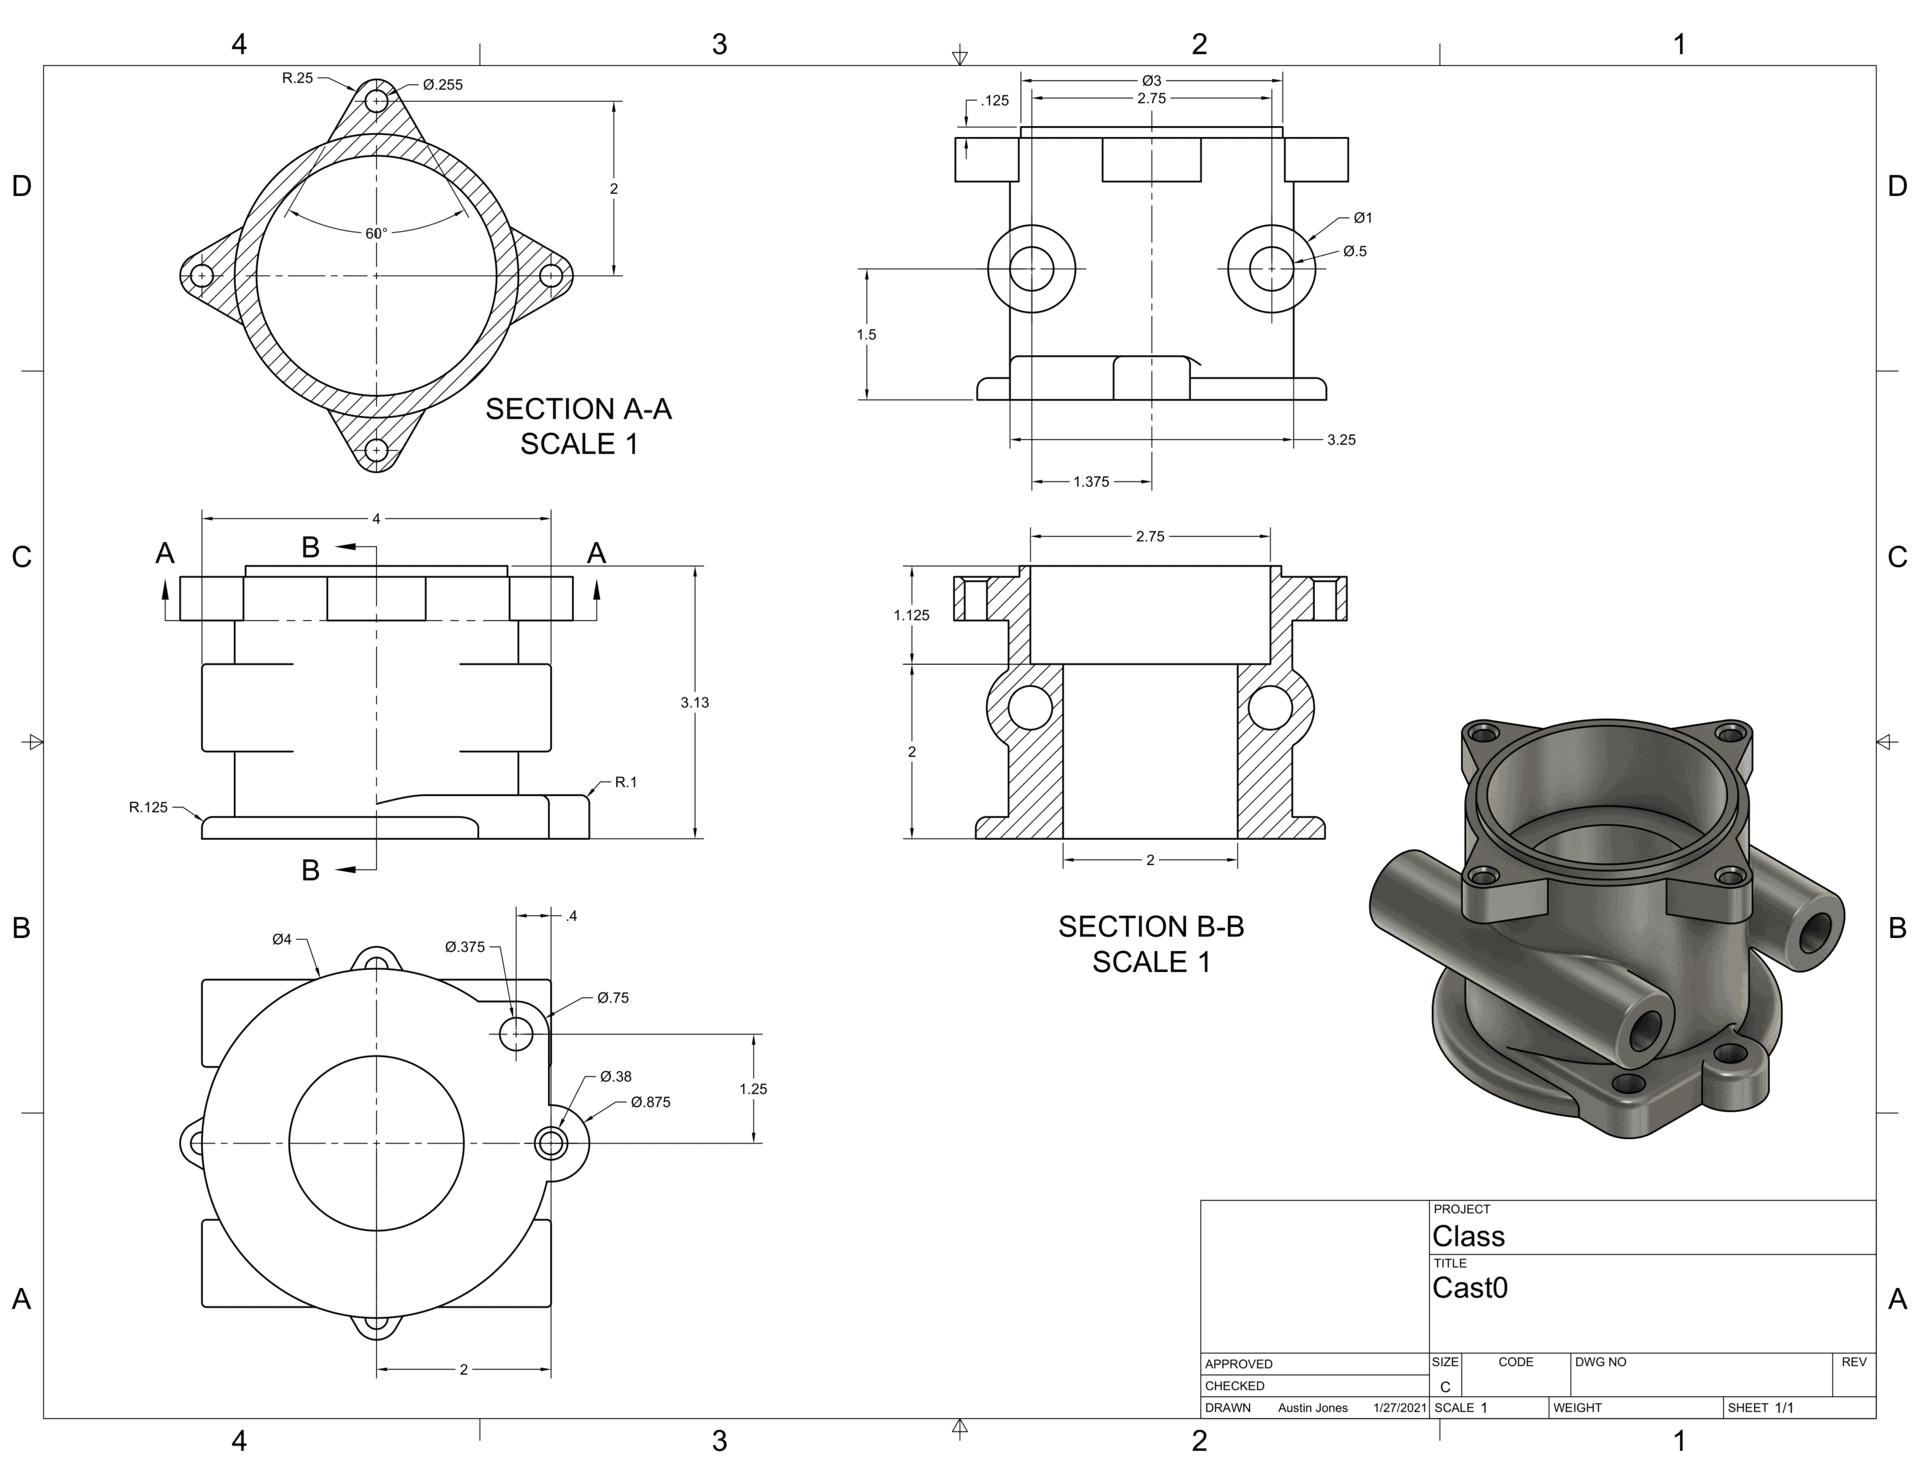 HW10.2-1